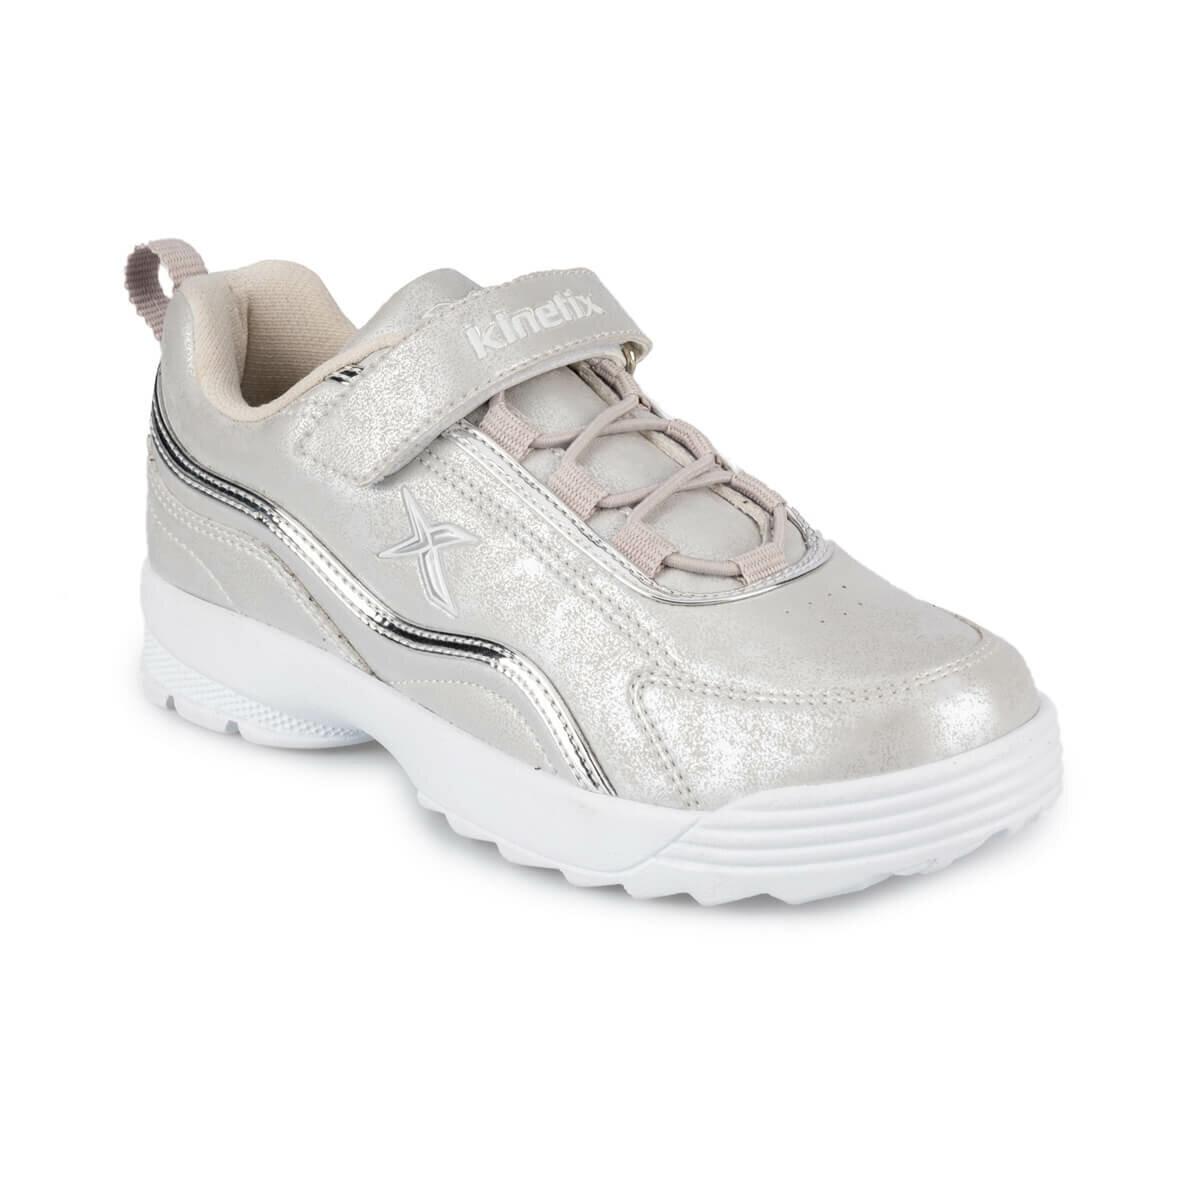 FLO SPACE 9PR Silver Female Child Sneaker Shoes KINETIX